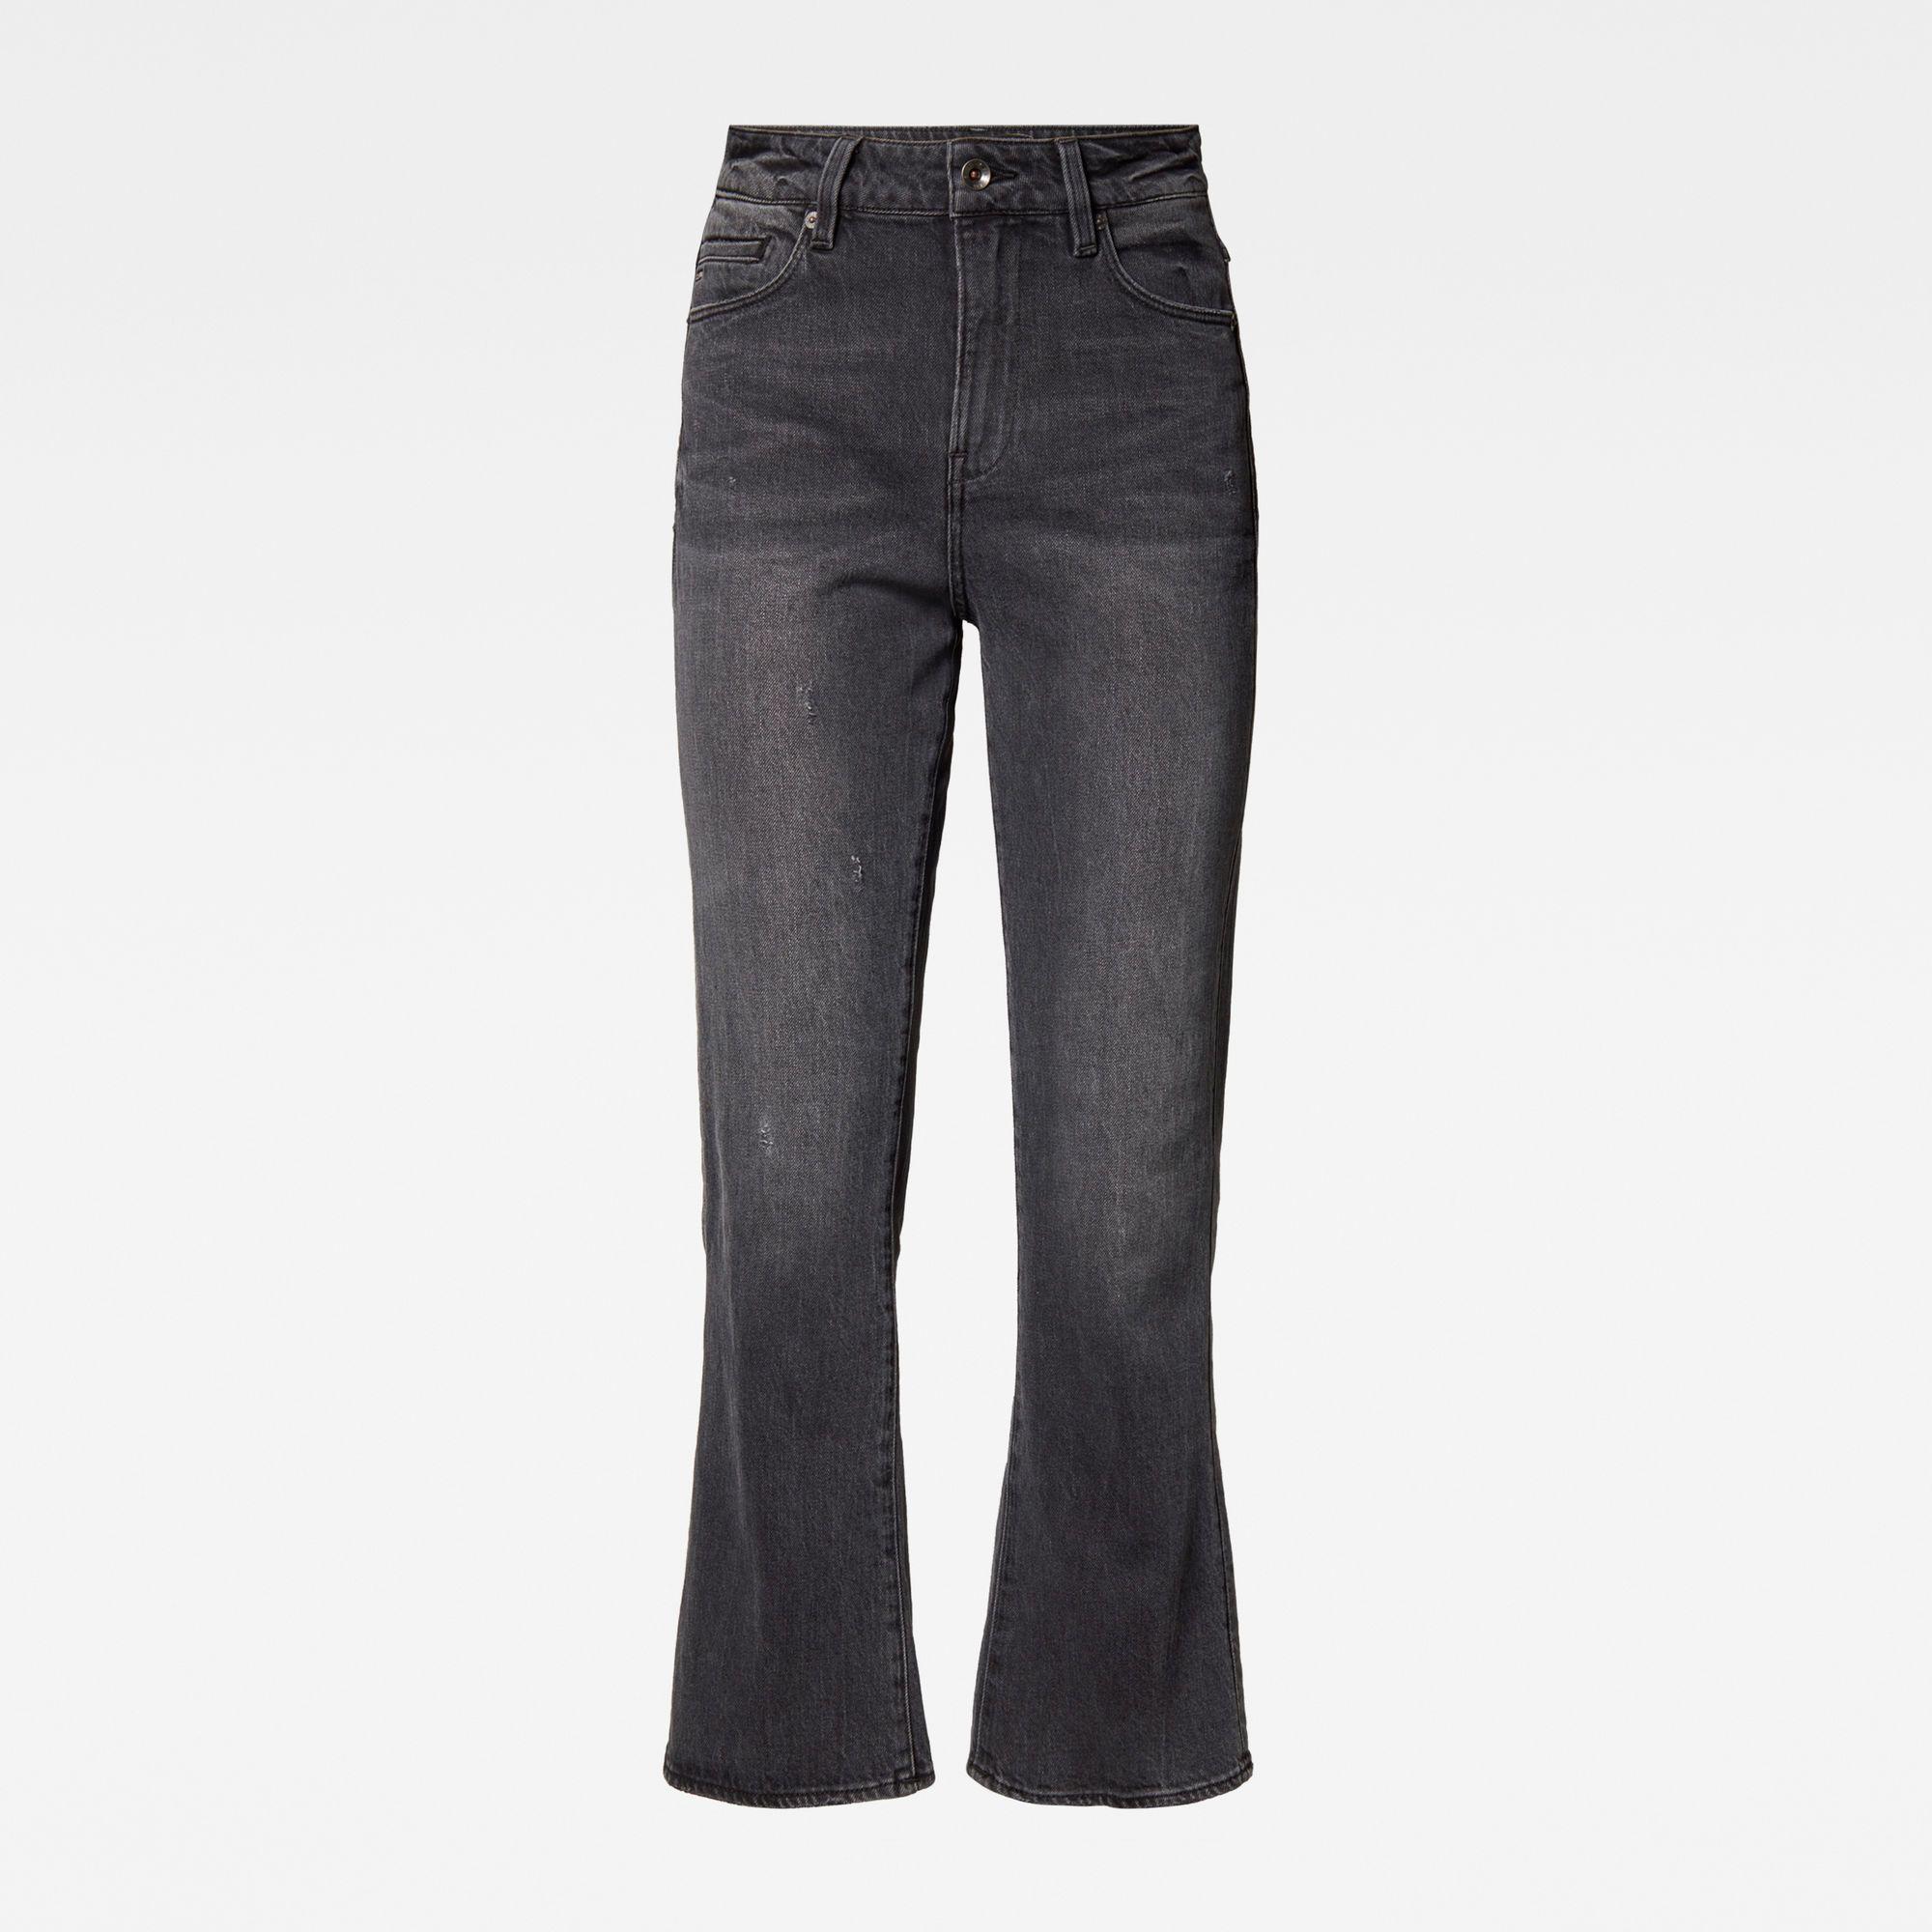 G-Star RAW Codam High Kick Flare 7/8 Jeans